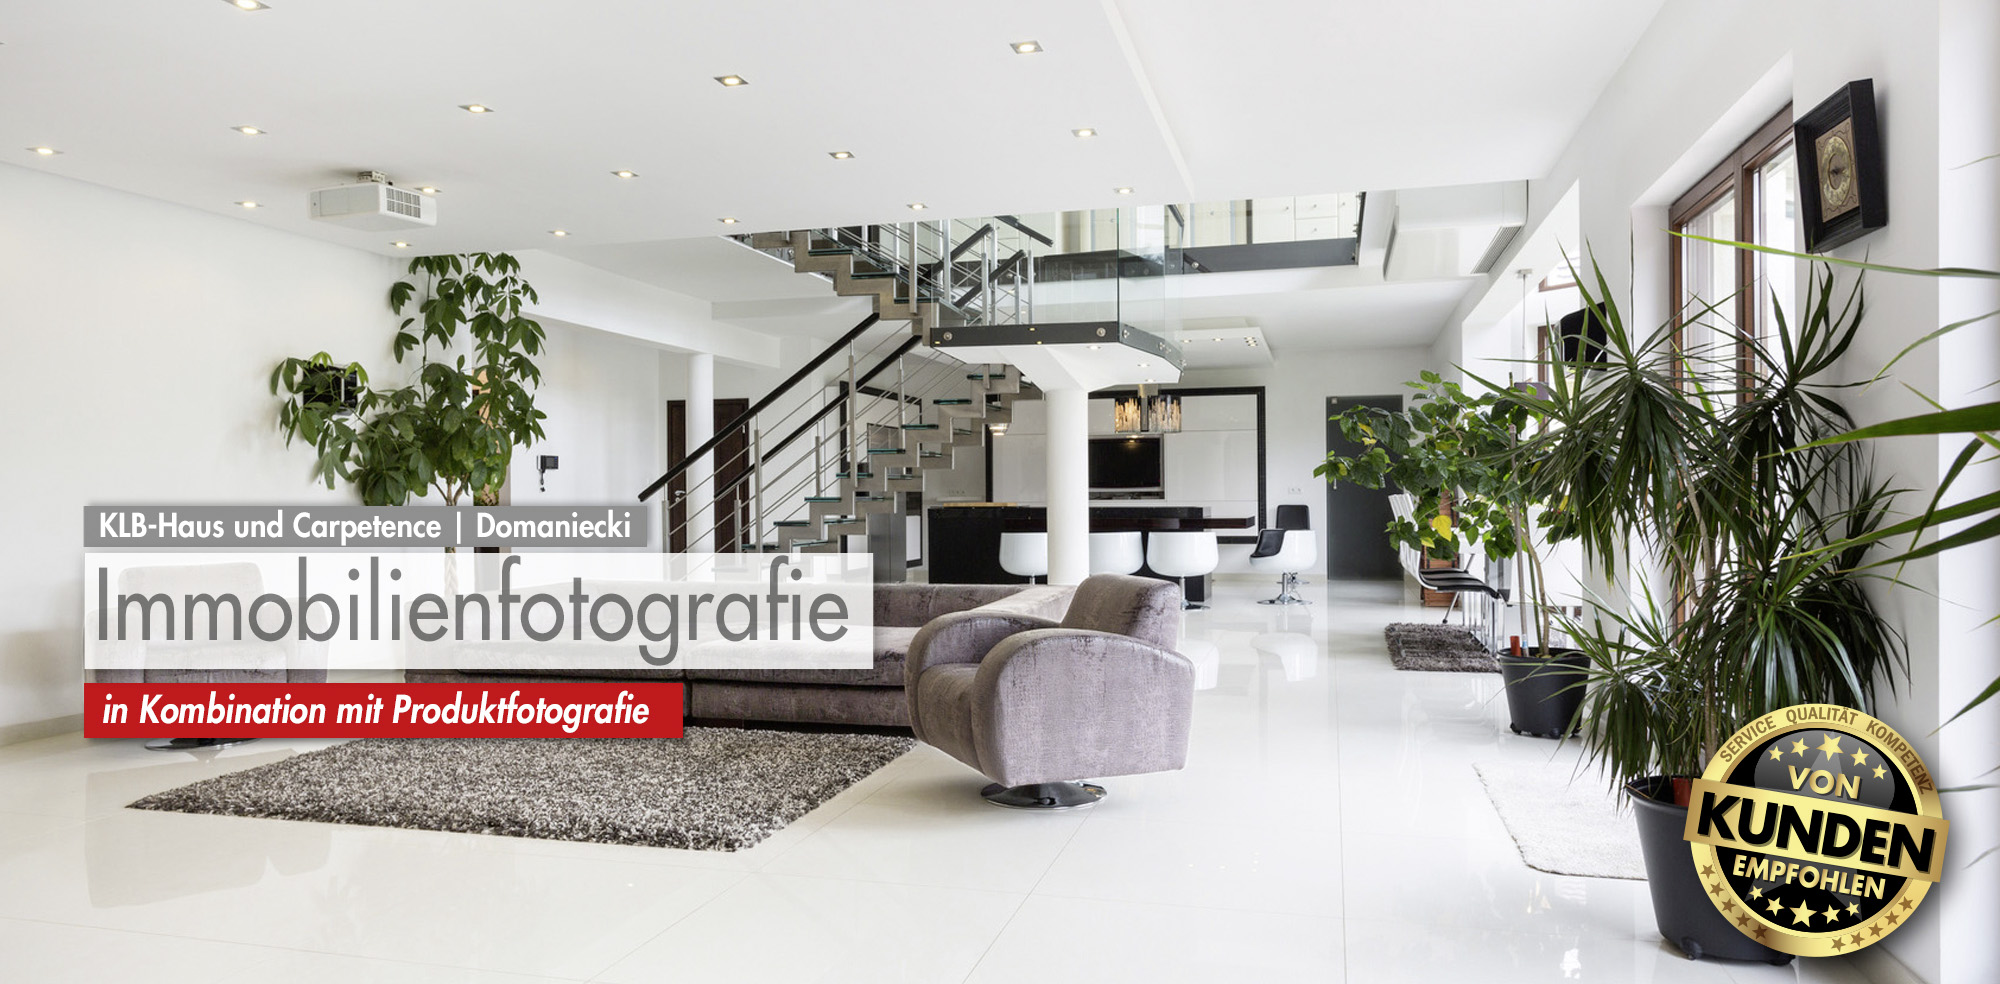 Immobilienfotografie@blickfang2_fotostudios_filmstudios